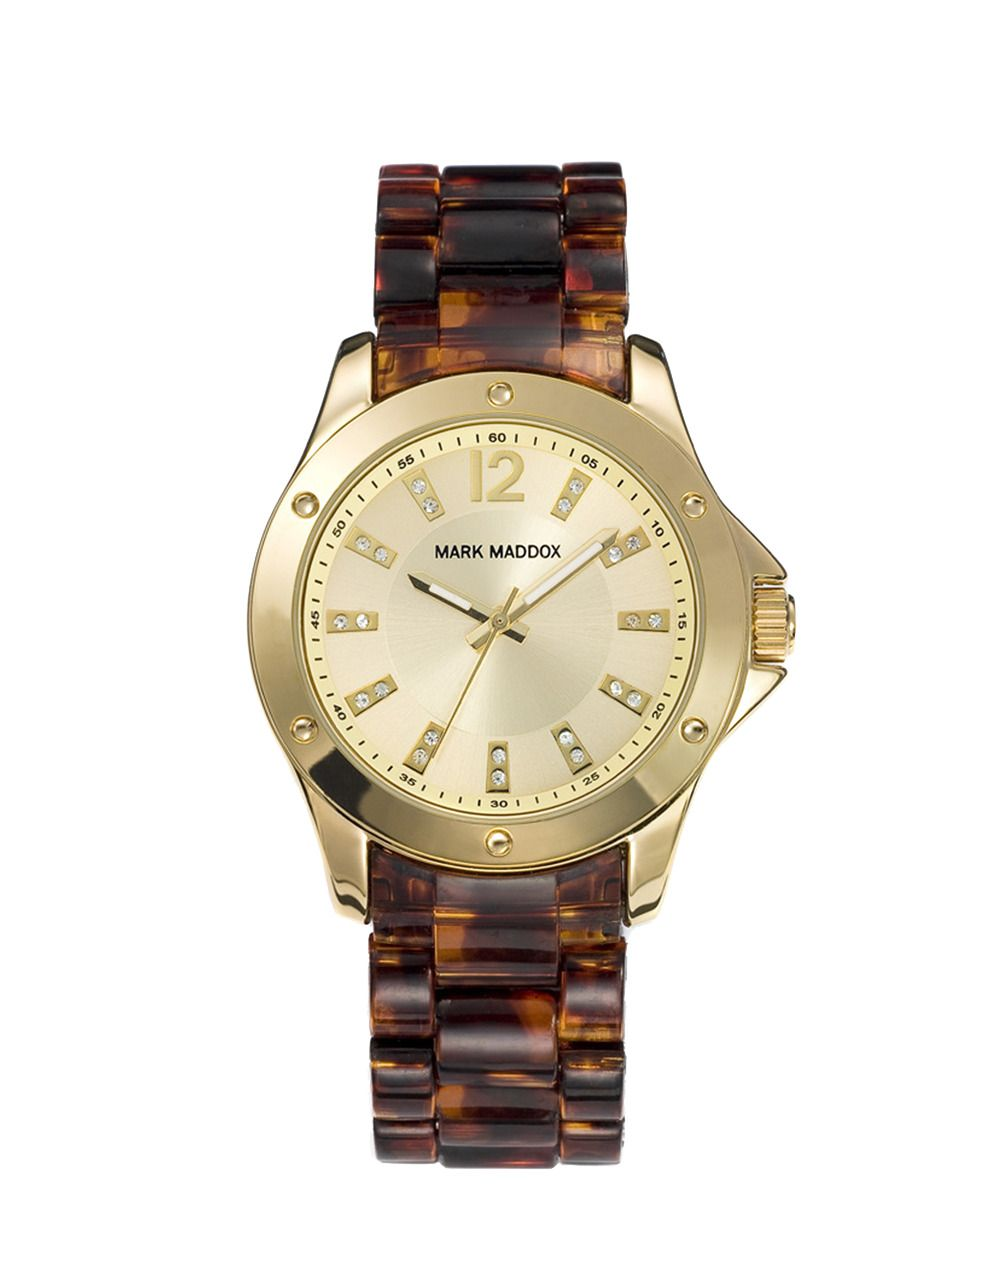 d8a857105c80 Reloj de mujer Mark Maddox - Mujer - Relojes - El Corte Inglés ...